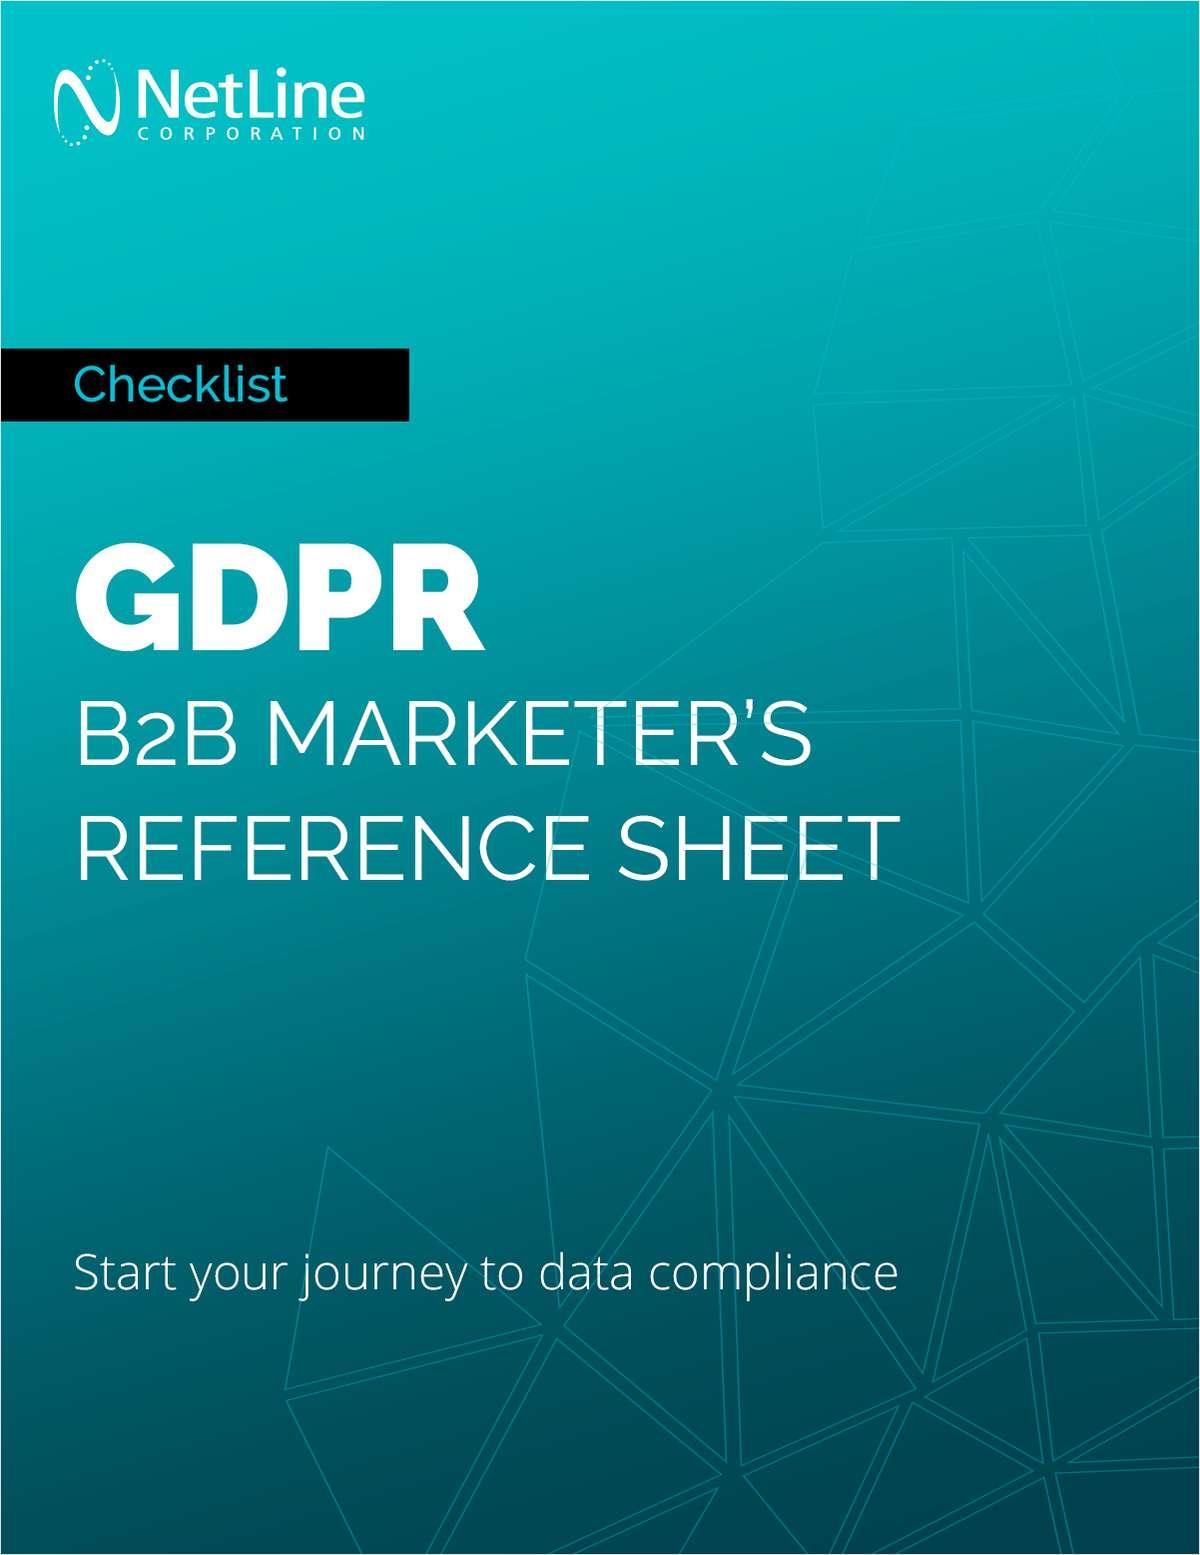 GDPR: B2B Marketer's Reference Sheet